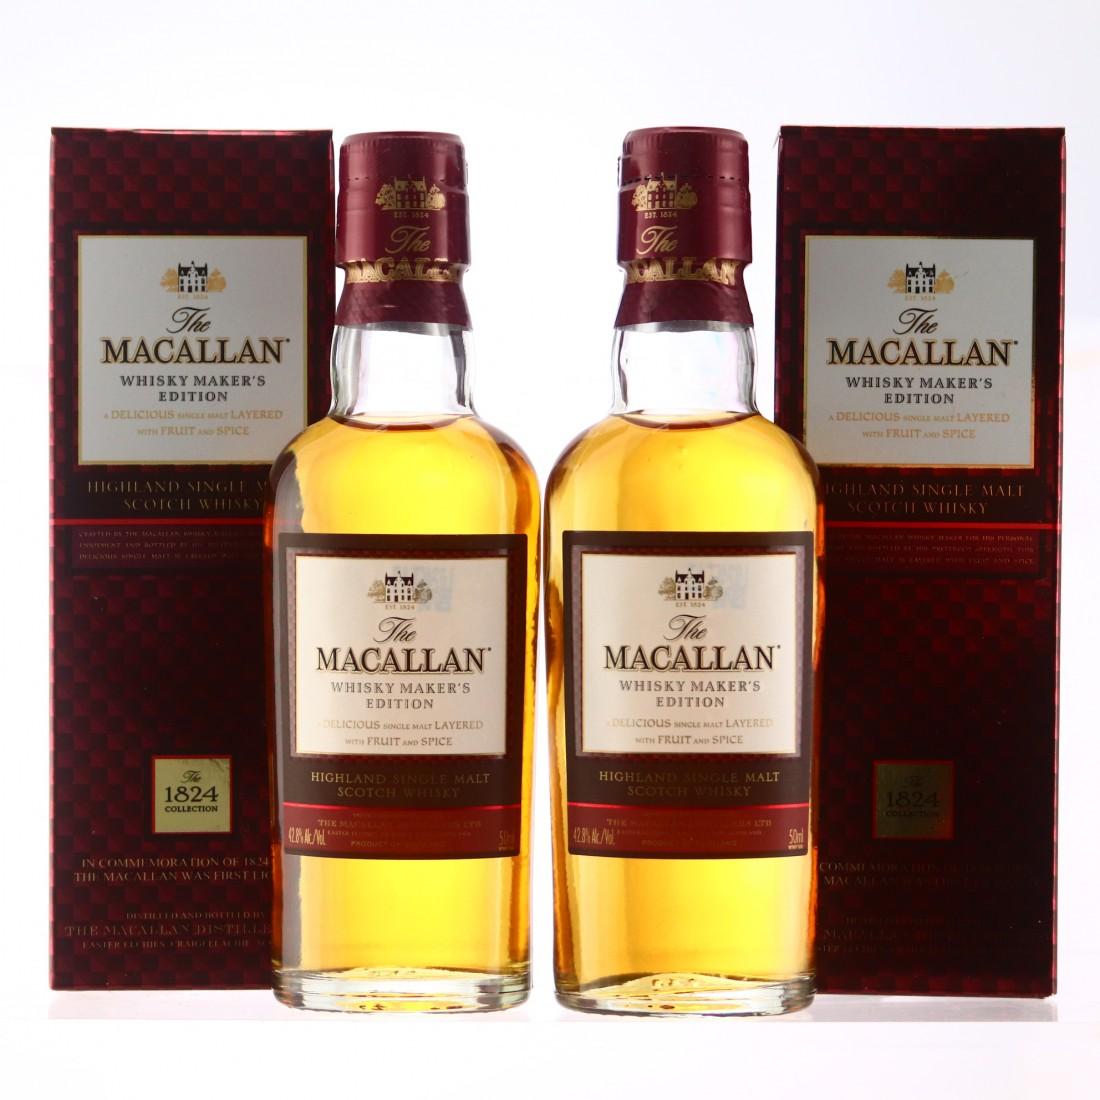 Macallan Whisky Maker's Edition Miniatures x 2